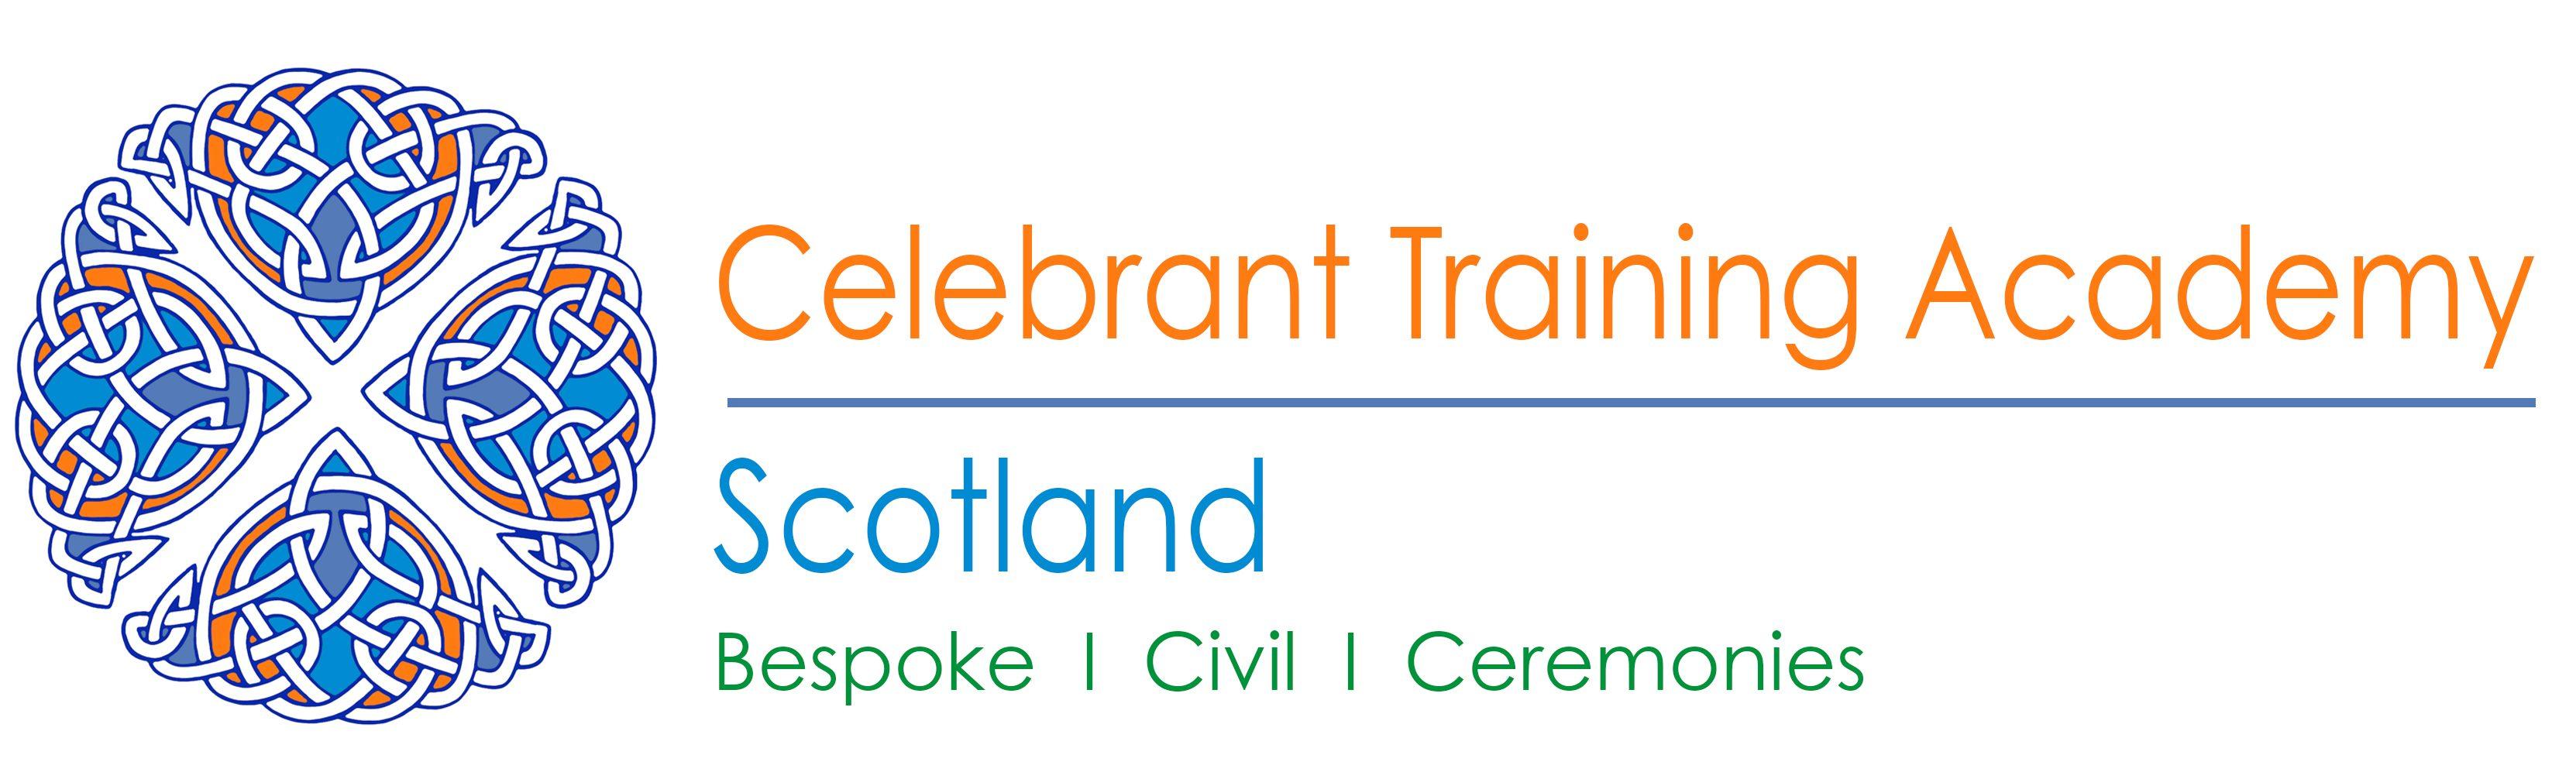 Celebrant Training Academy Scotland